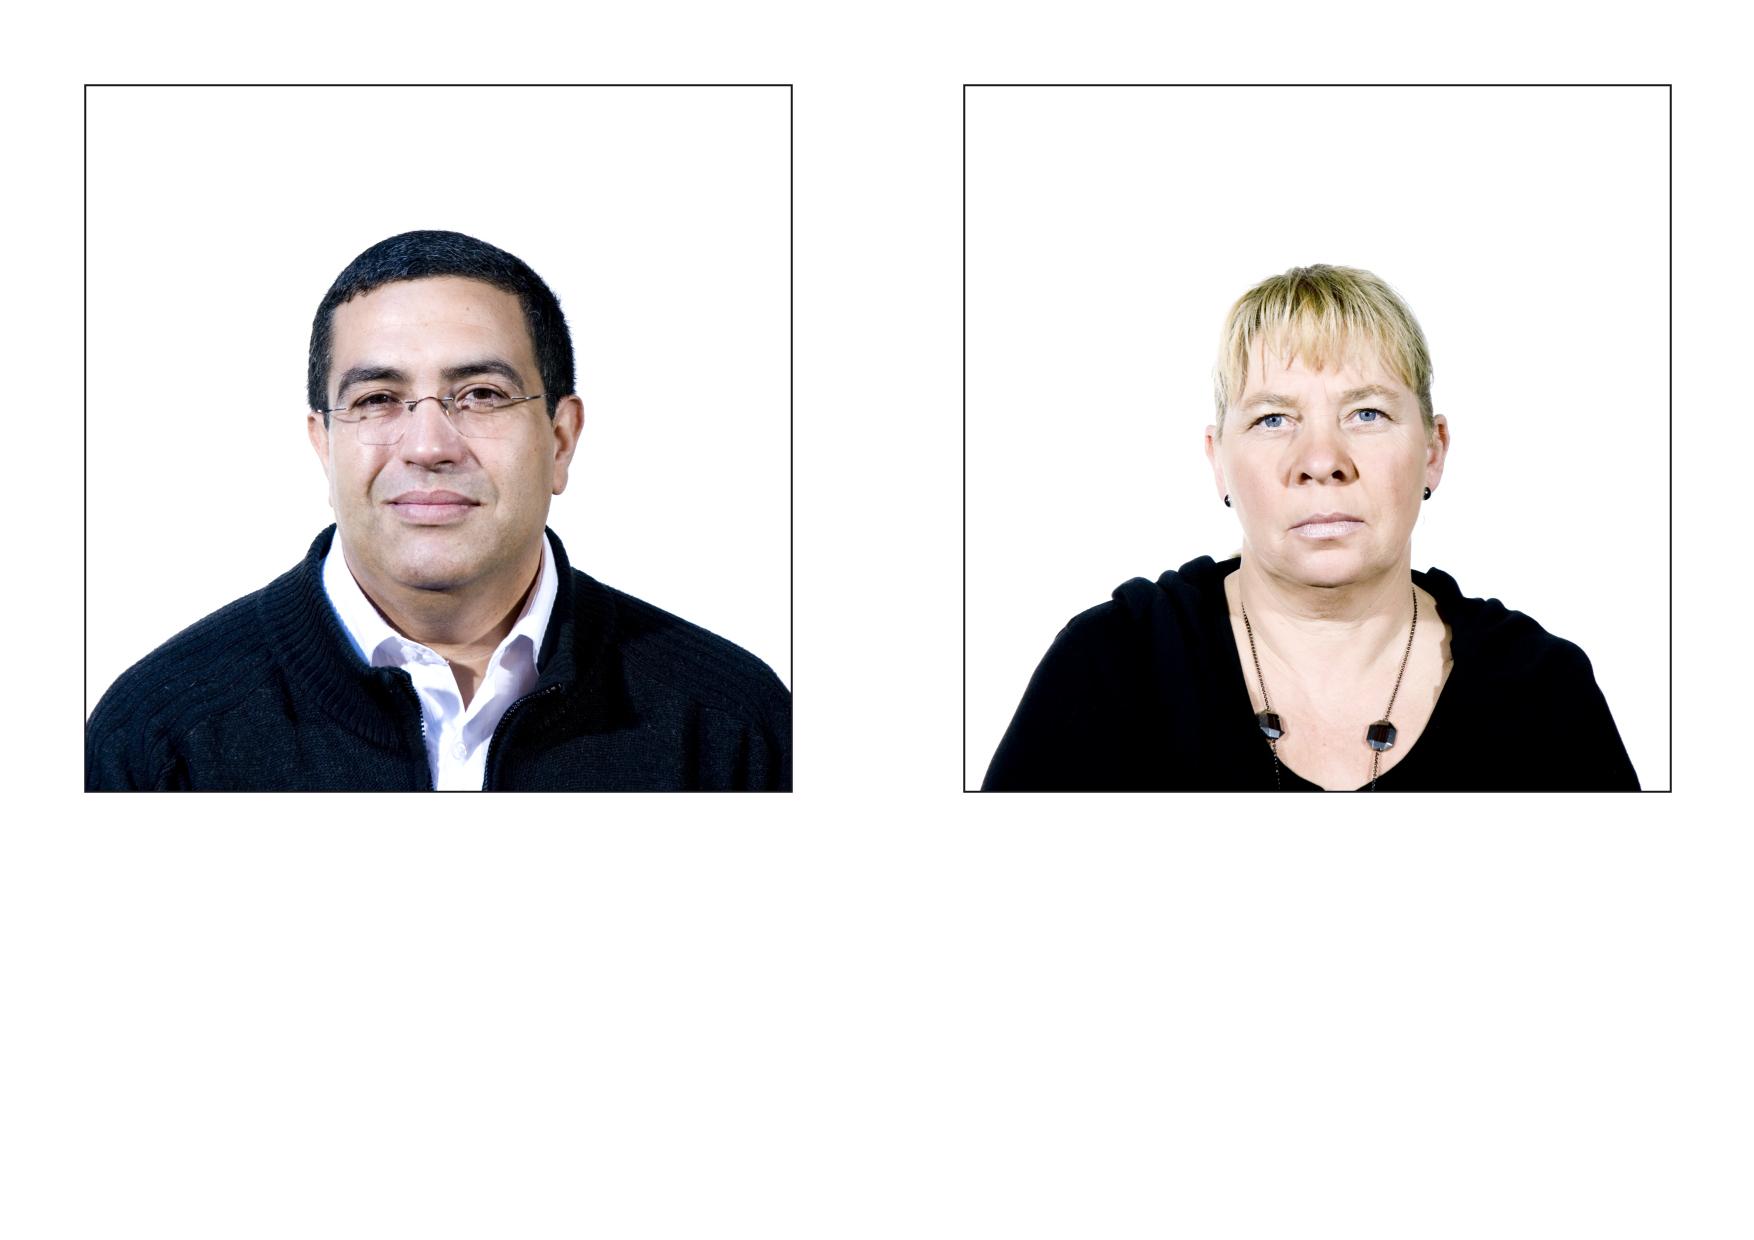 portraits-2-p6-7.jpg